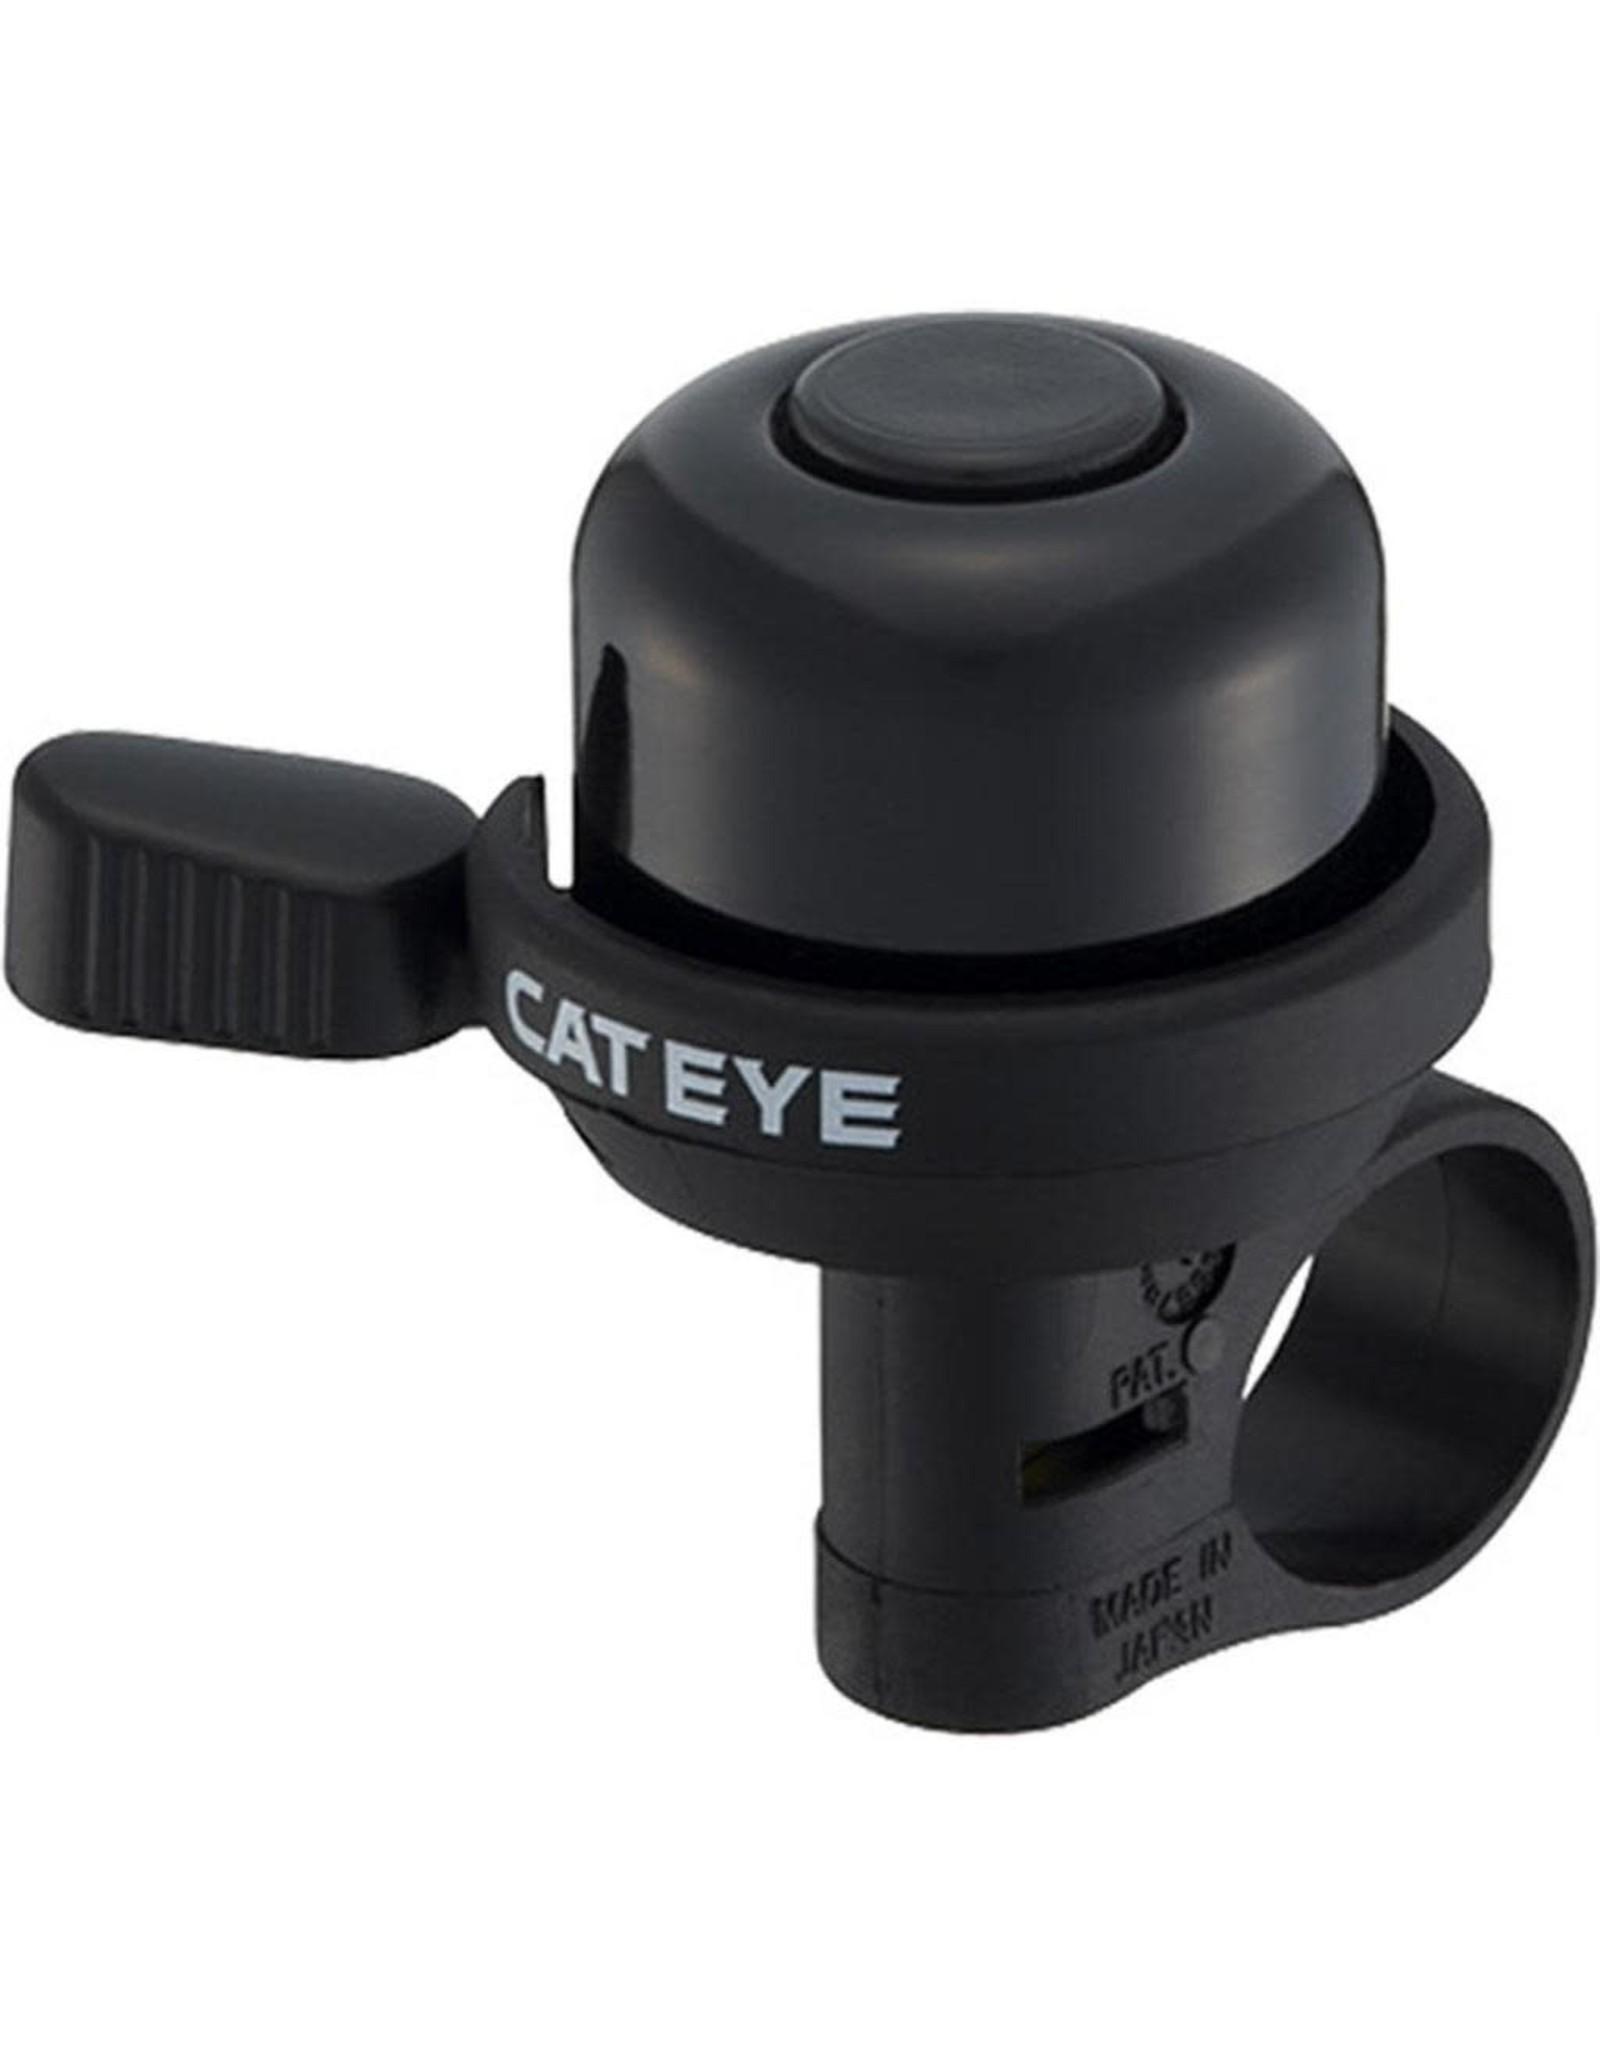 CatEye CatEye - Wind PB-1000, Bell, Black